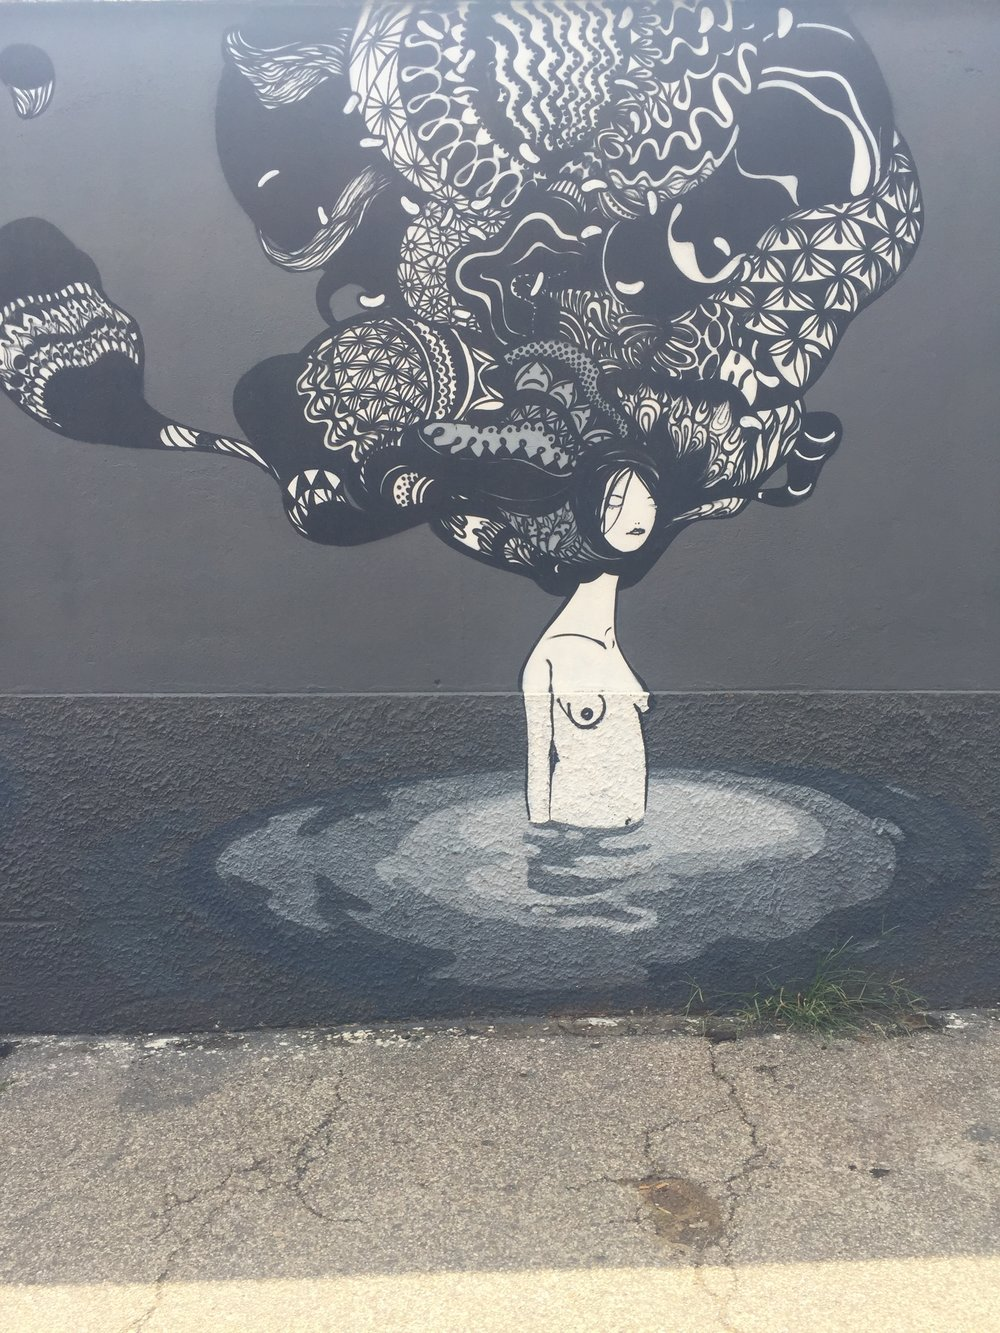 Street Art Series by Herbert Baglione: Testaccio